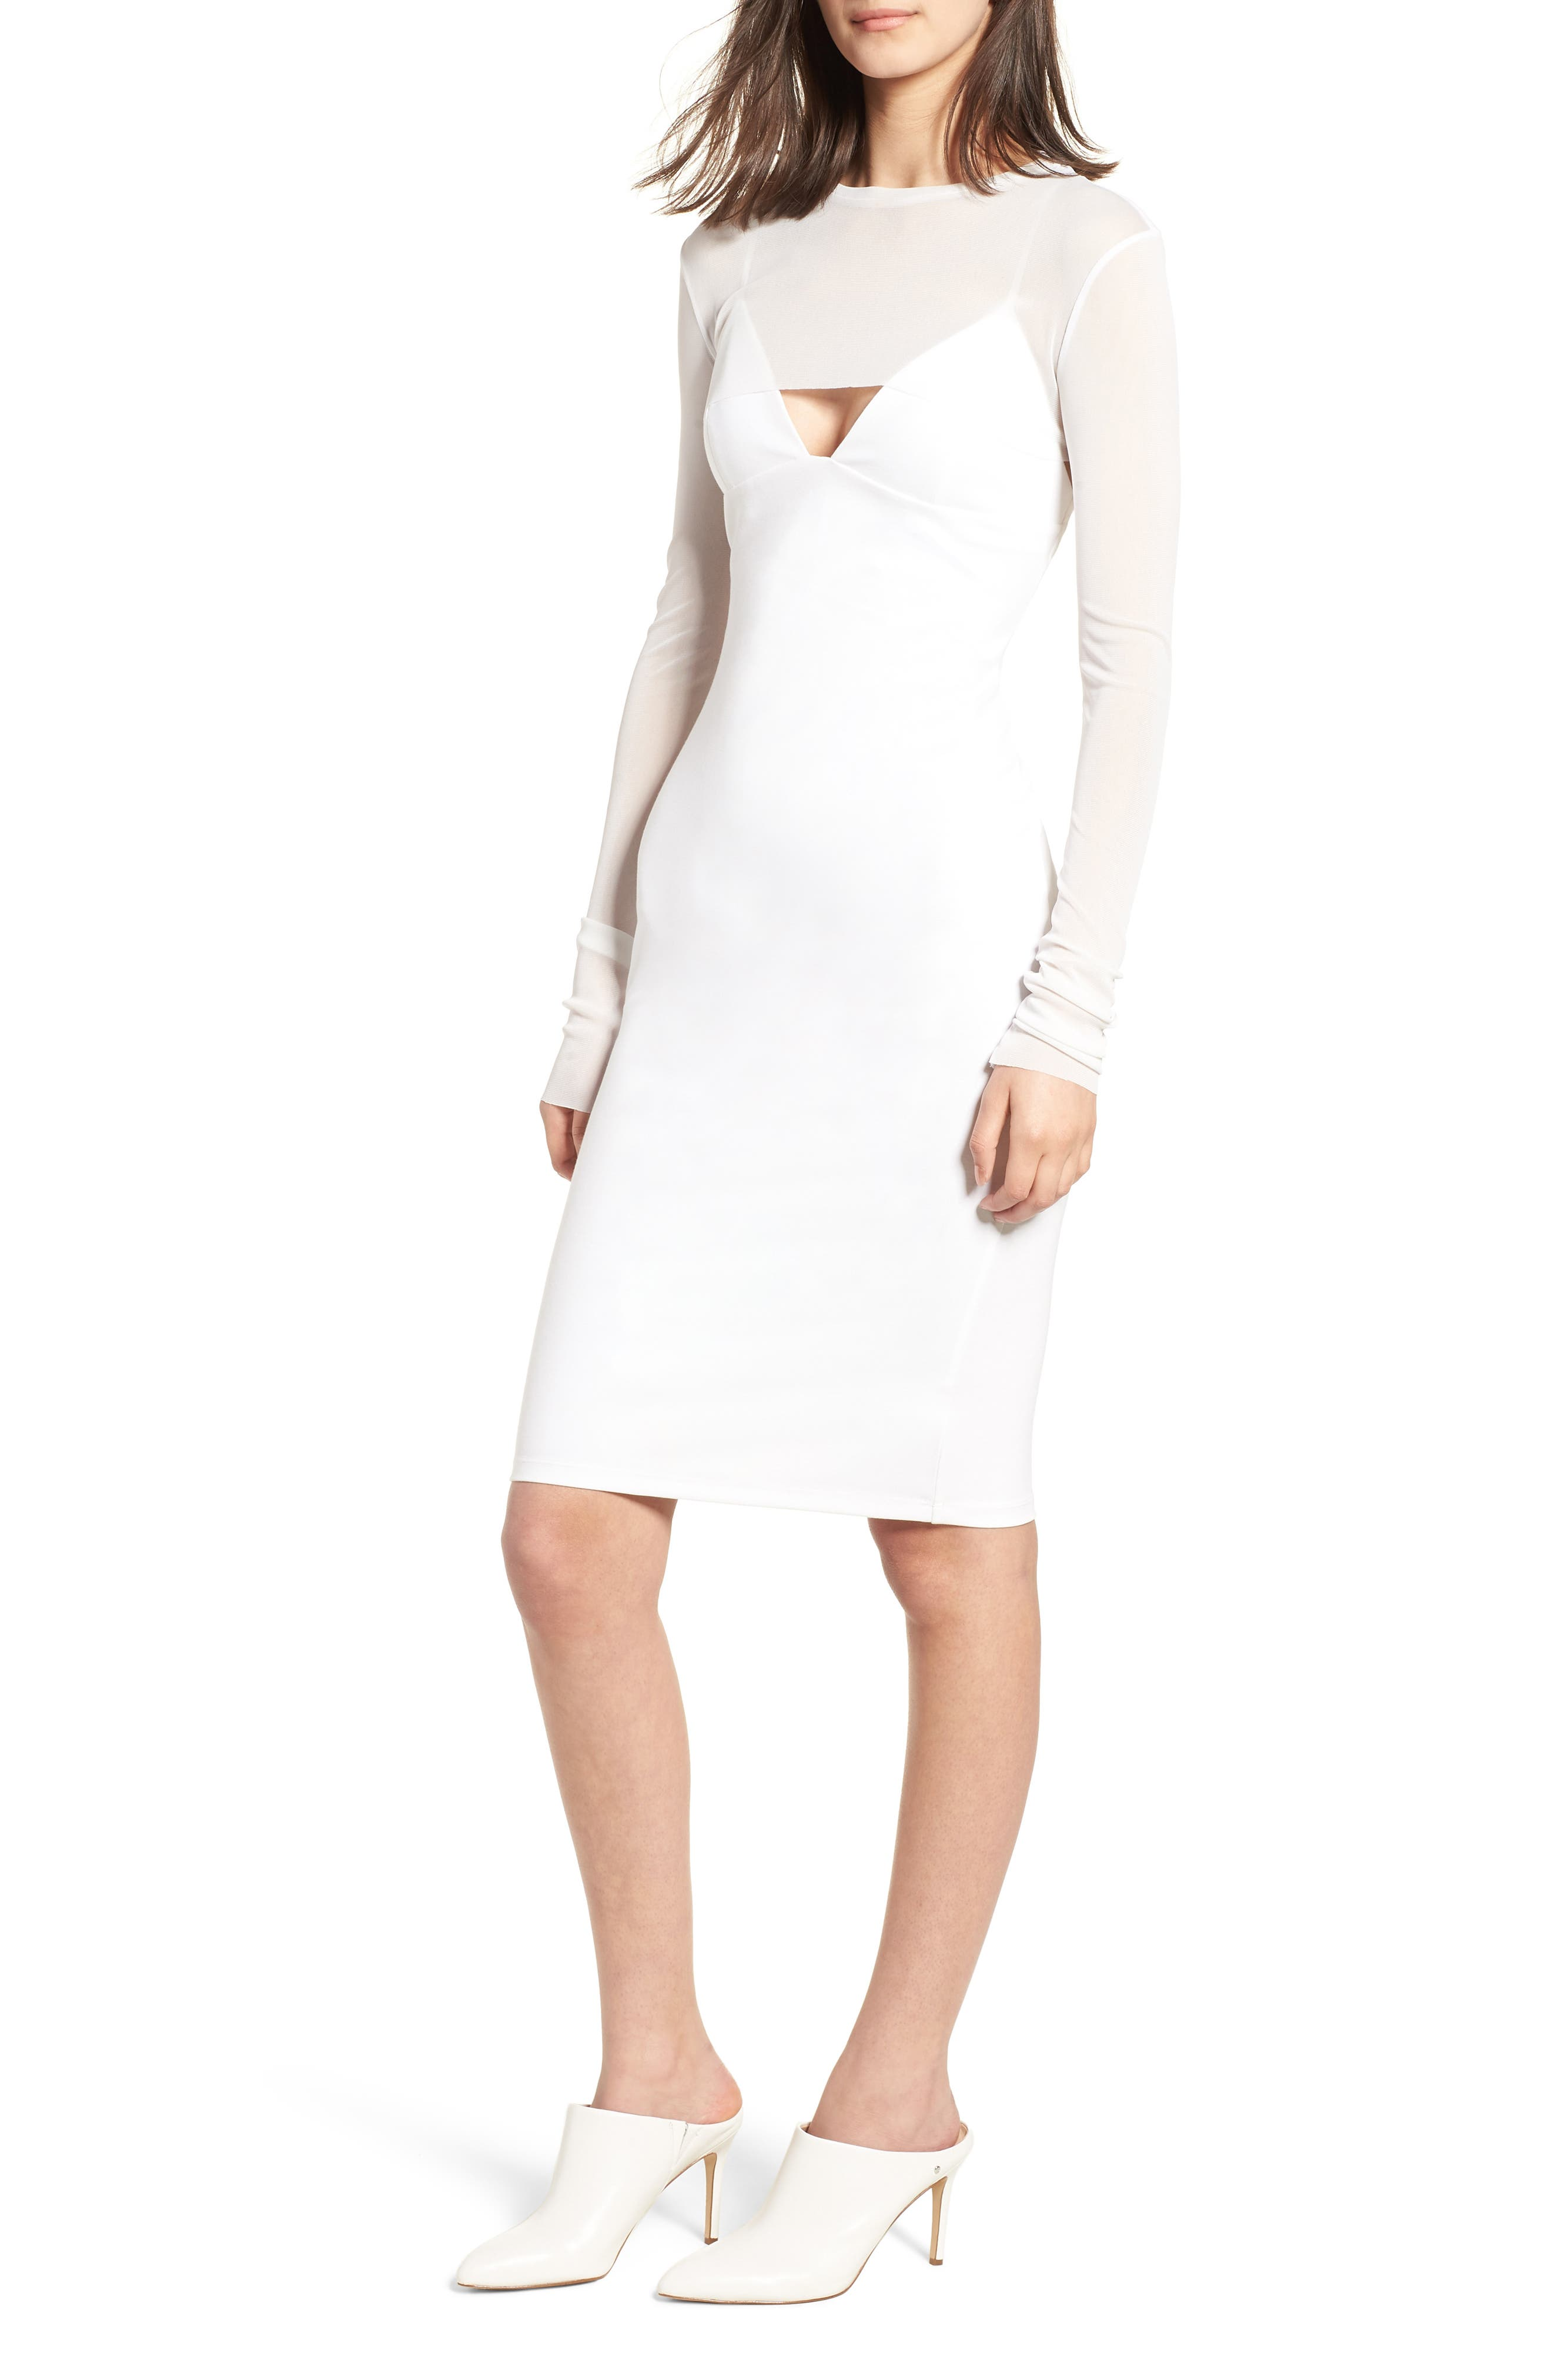 Main Image - KENDALL + KYLIE Mesh Overlay Sheath Dress